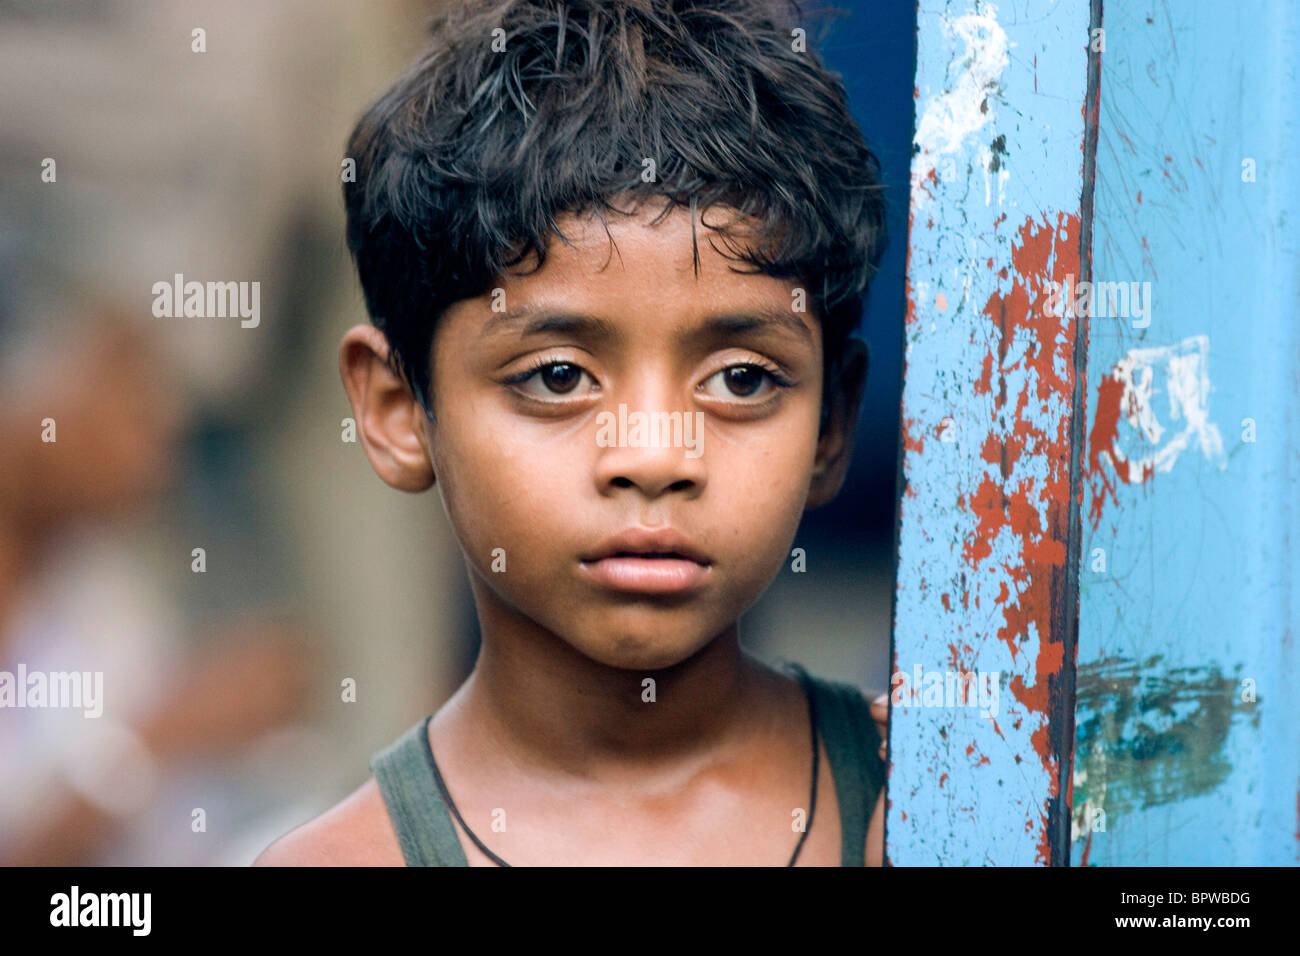 Ayush Mahesh Khedekar Slumdog Millionaire 2008 Stock Photo Alamy